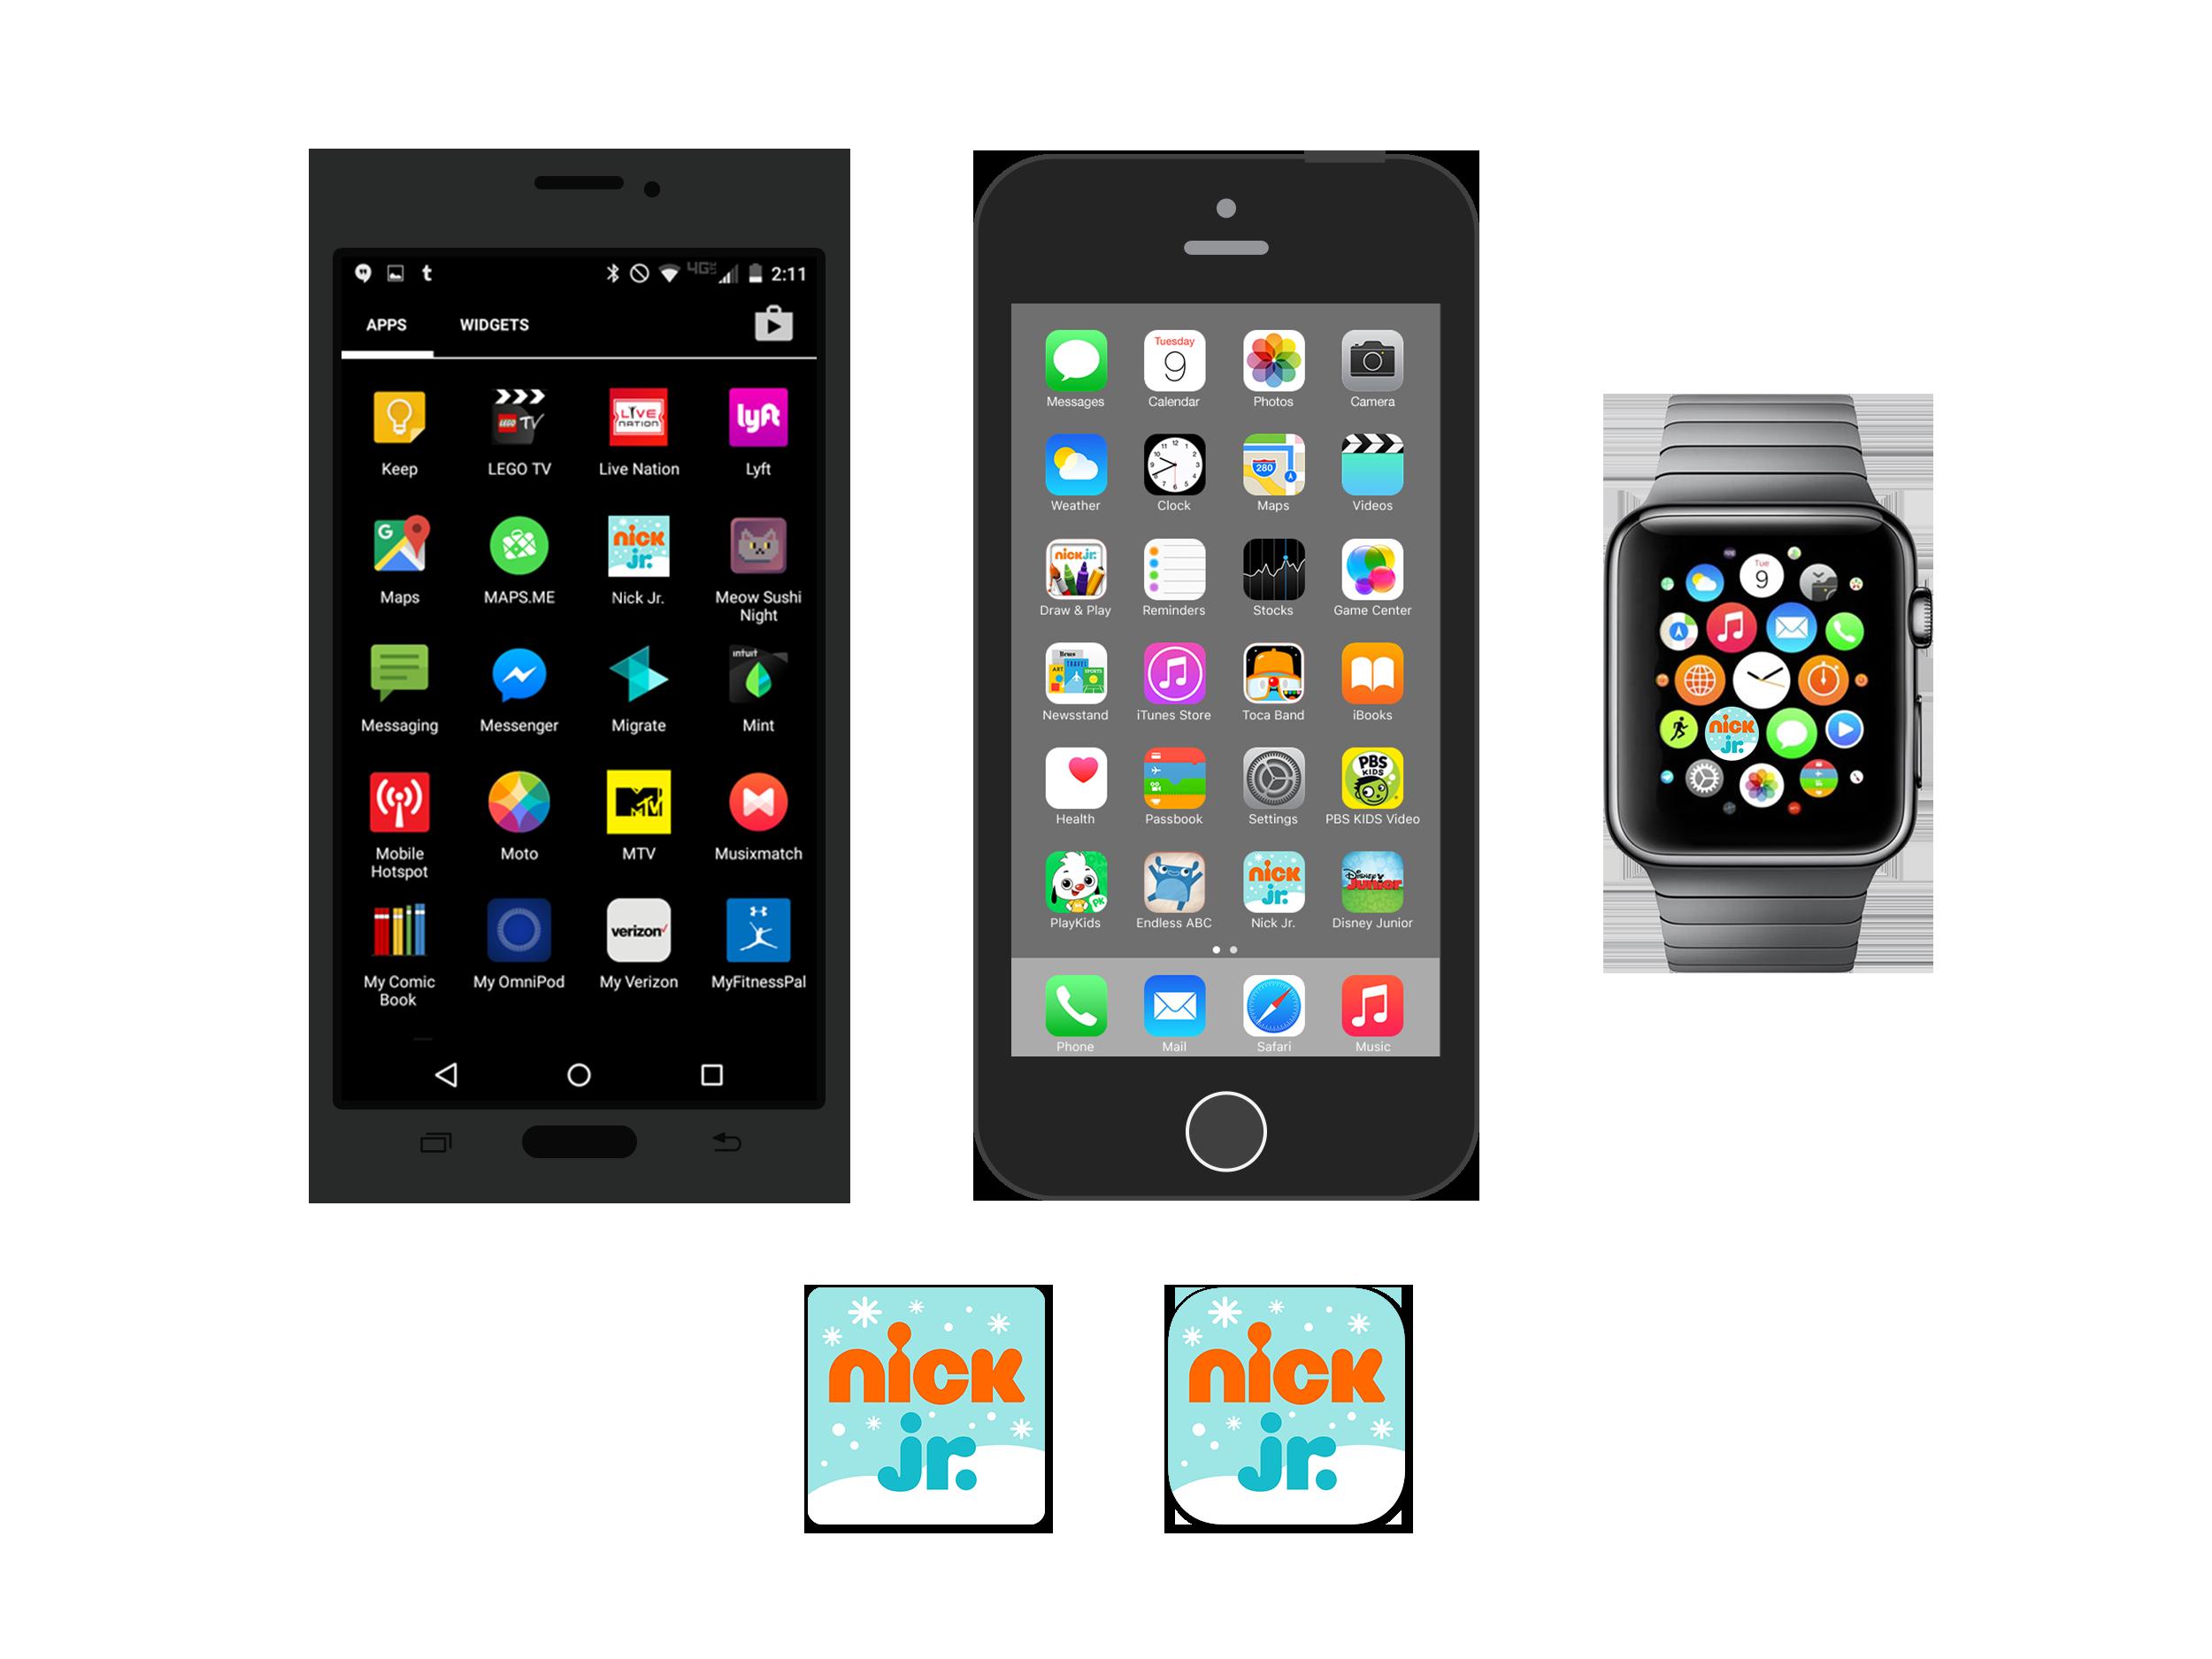 nickjr-app-icons-mockup.png